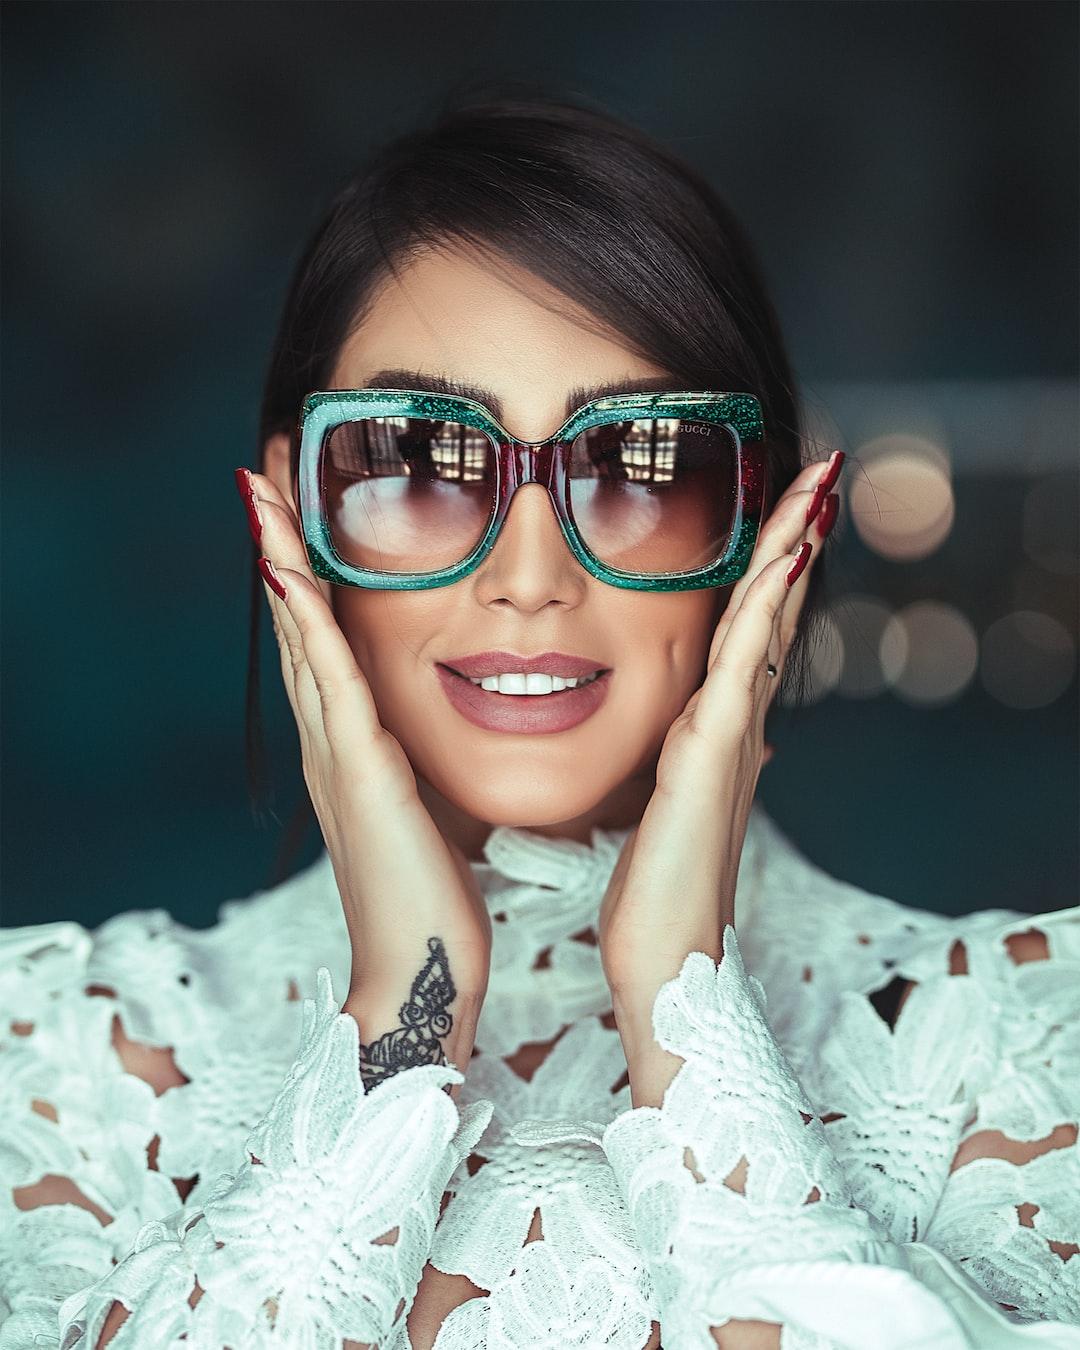 Ocean Nonprofit Selling Pricey Sunglasses